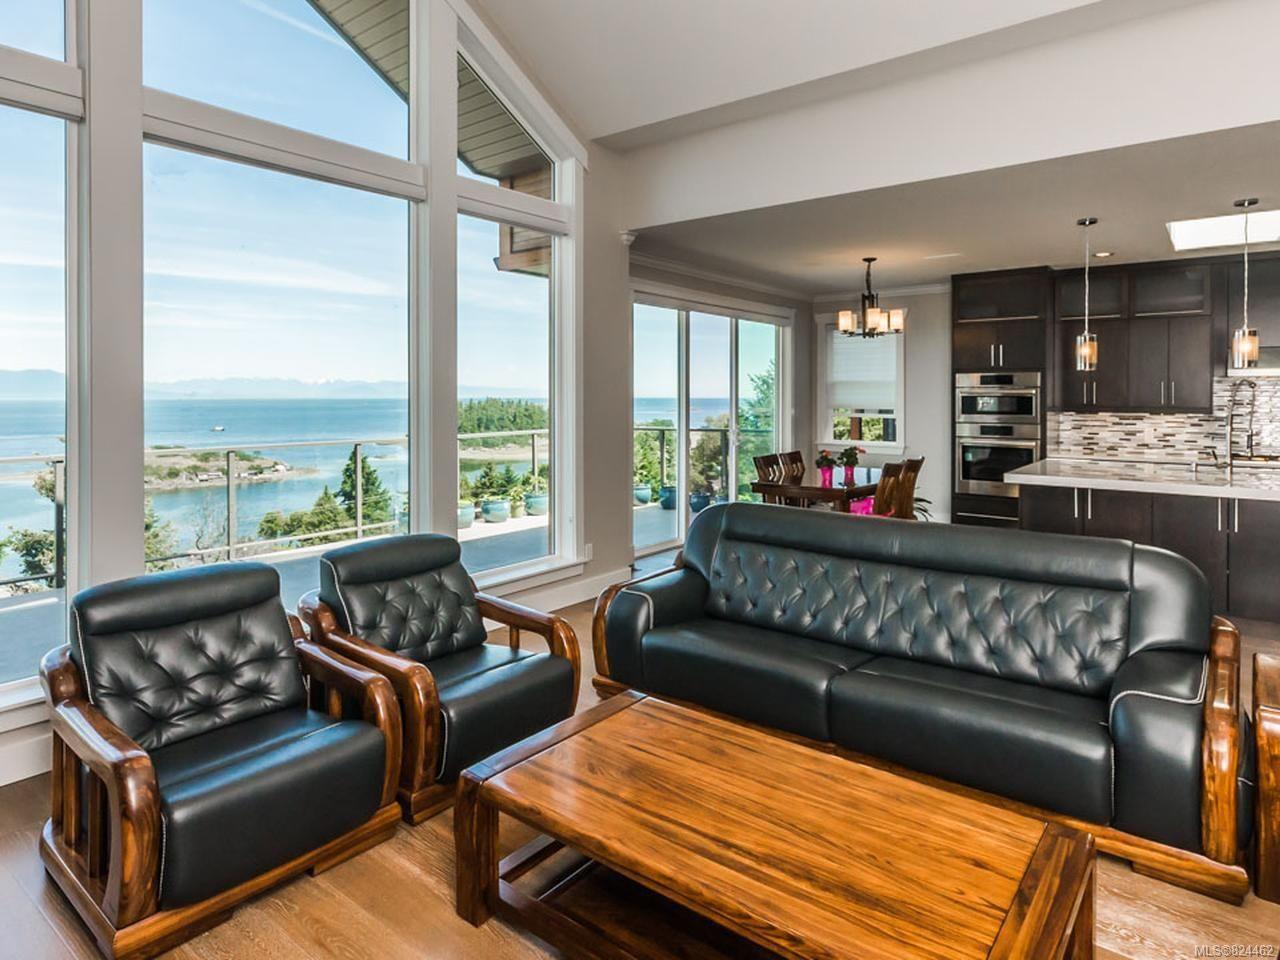 Photo 4: Photos: 3864 Gulfview Dr in NANAIMO: Na North Nanaimo House for sale (Nanaimo)  : MLS®# 824462